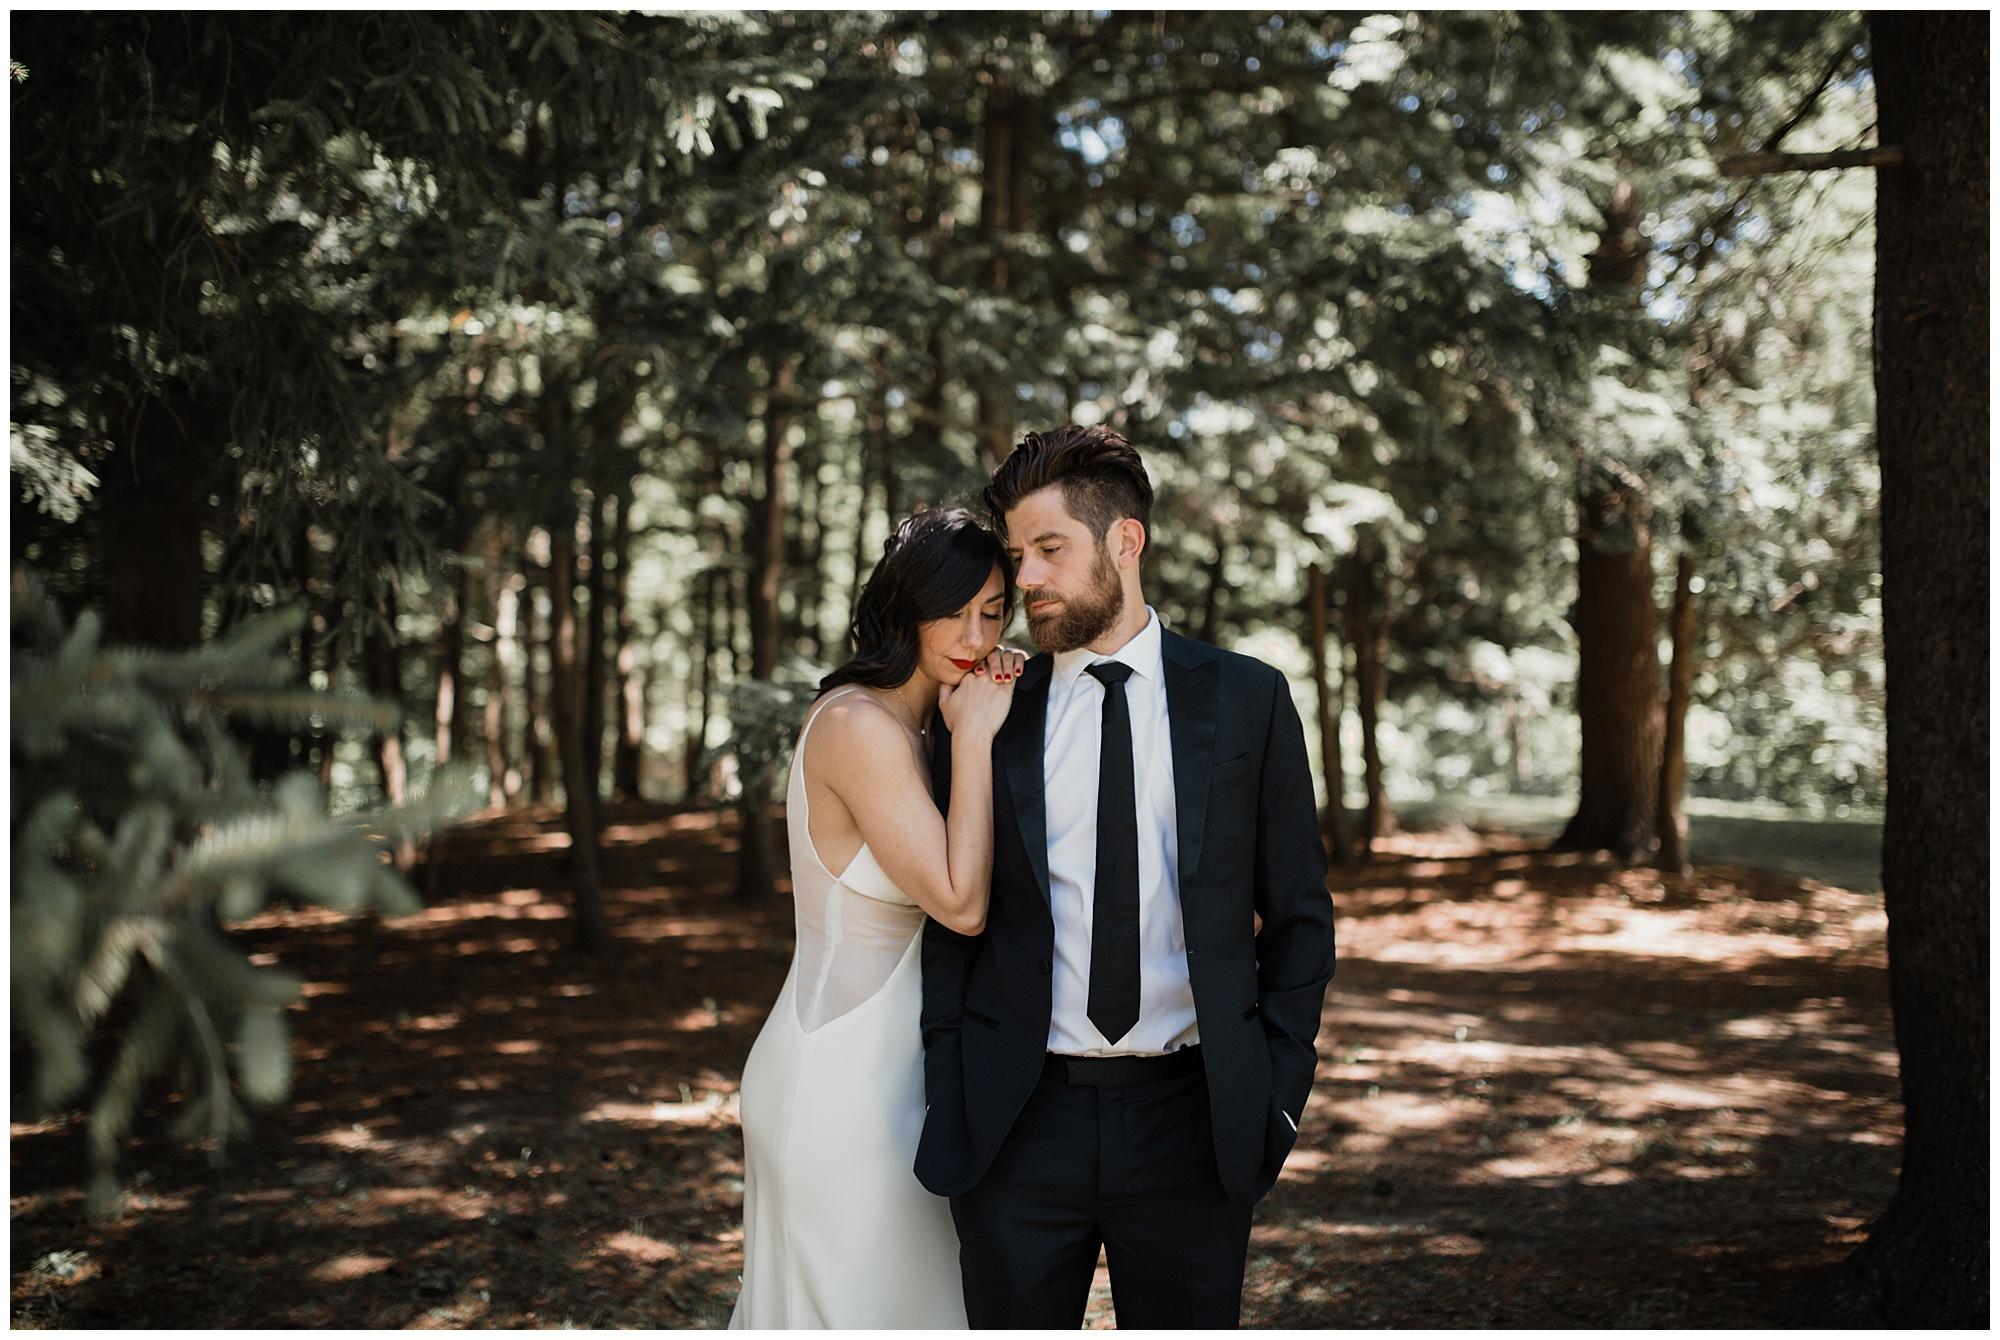 allerton_park_wedding_champaign_il_chicago_wright_photographs_ne_0064.jpg